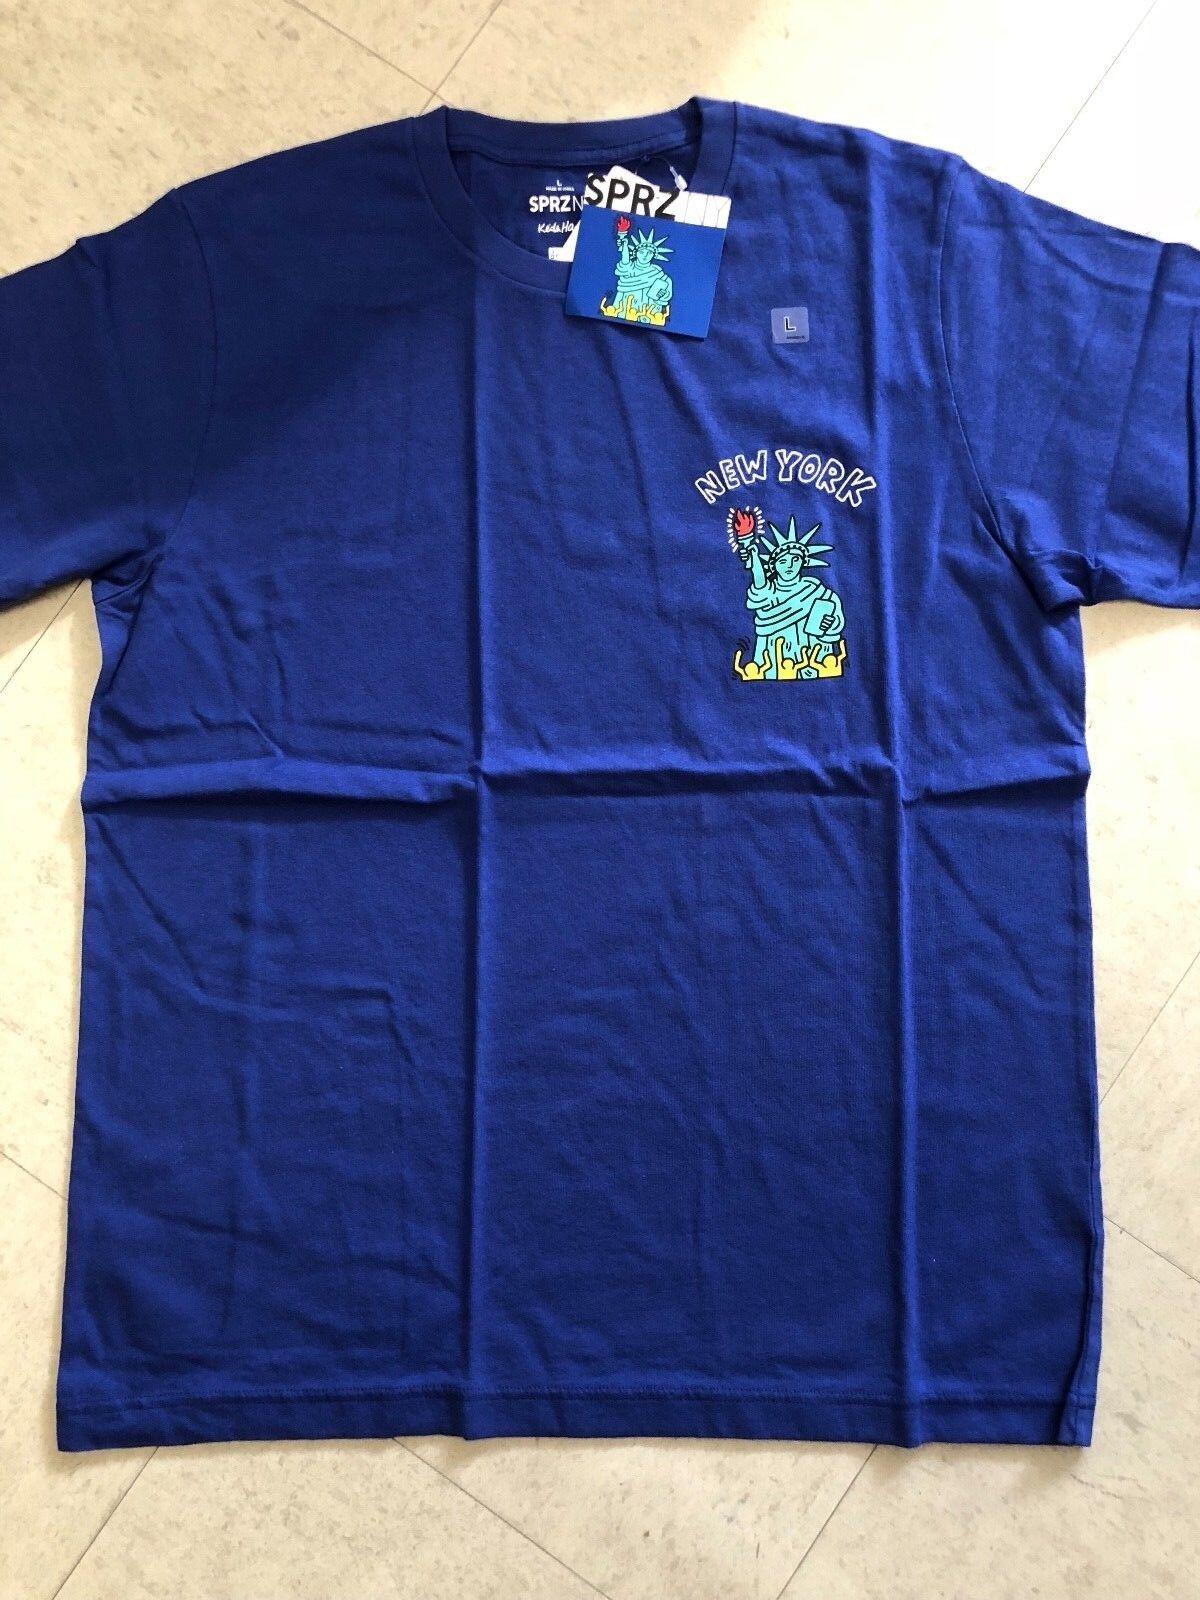 Keith Haring X UNIQLO SPRZ NY Graphic T-shirt bluee US size S-3XL MoMa New York